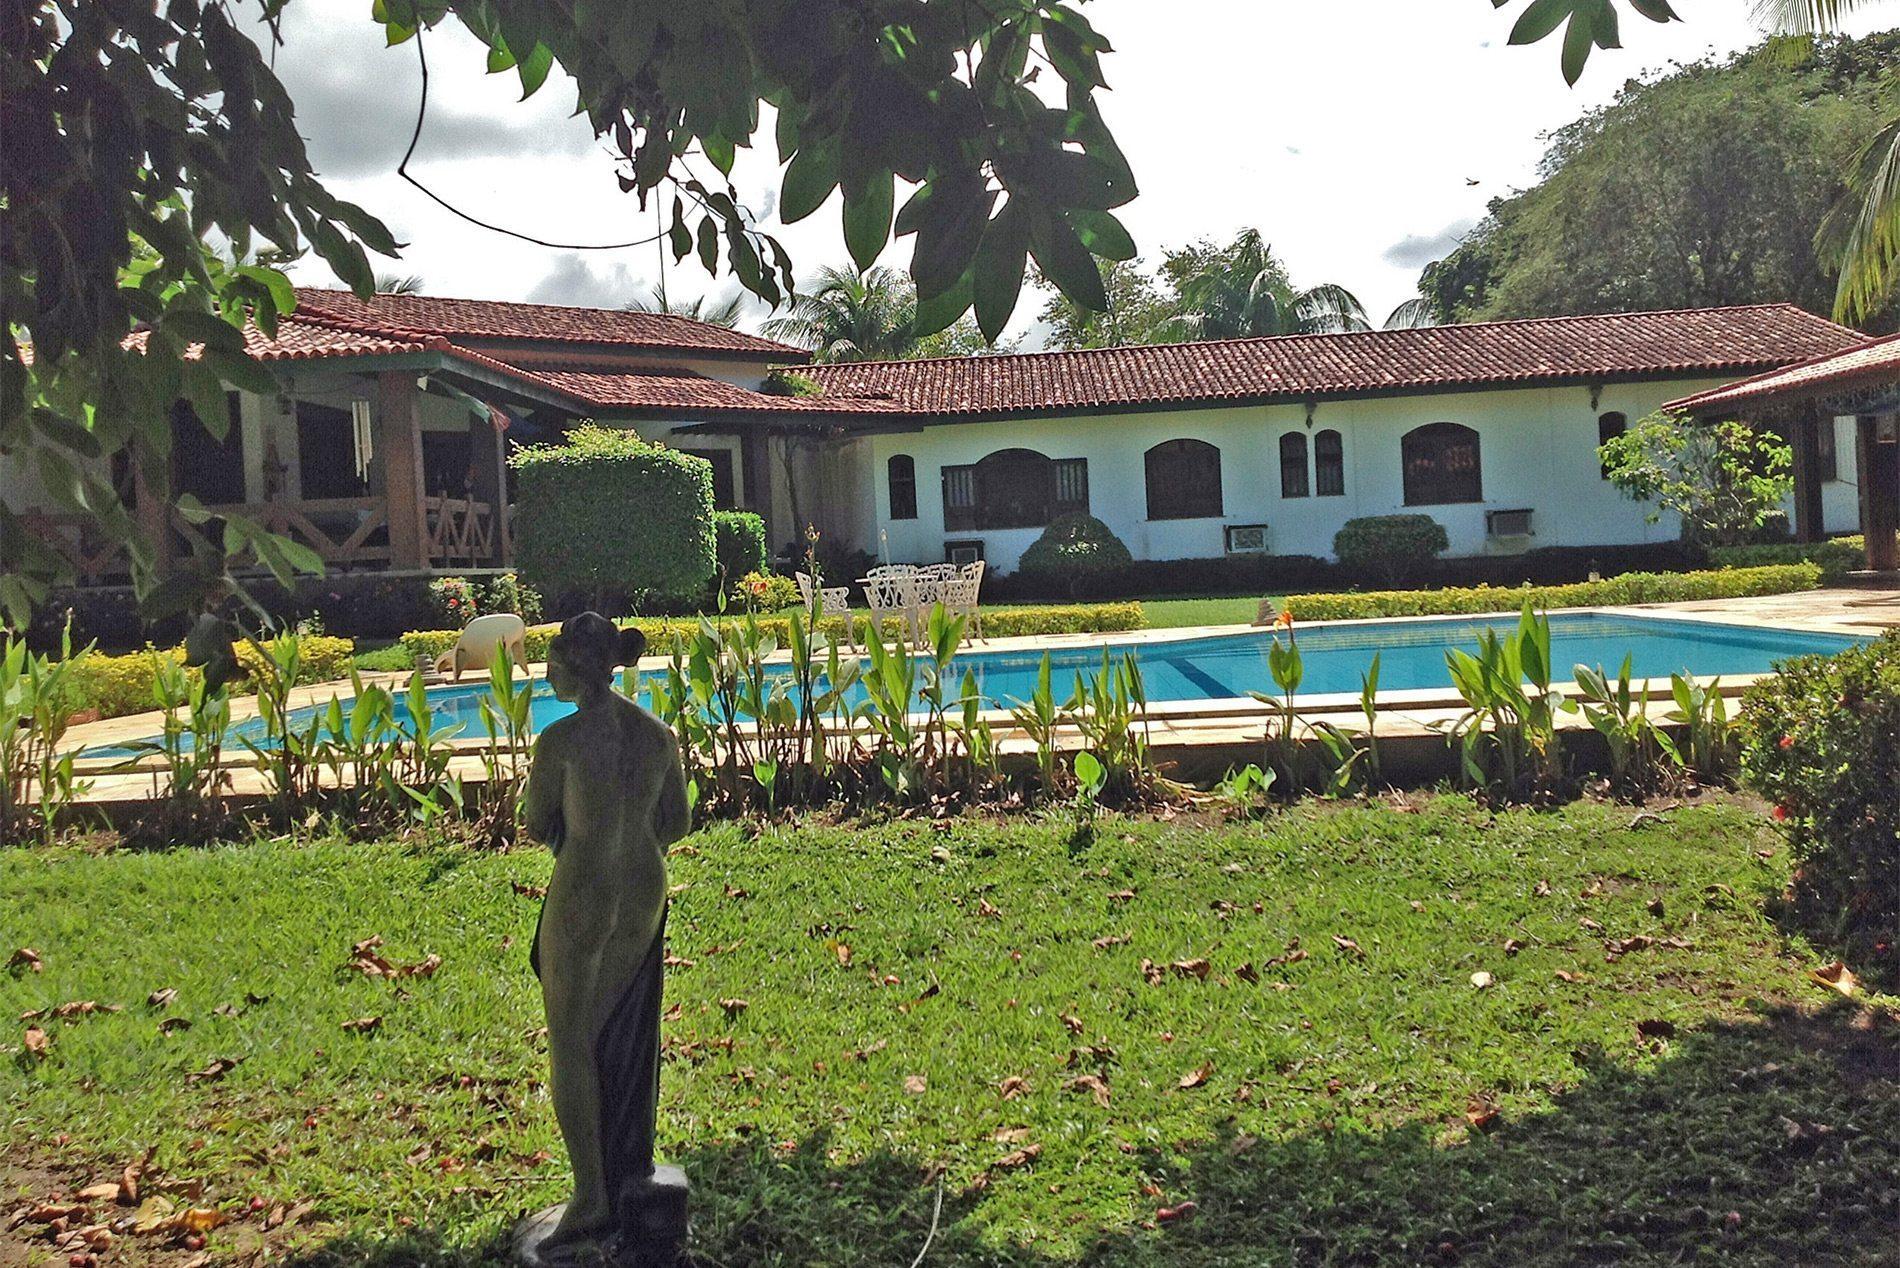 Wonderful home for sale in Encontro das Águas